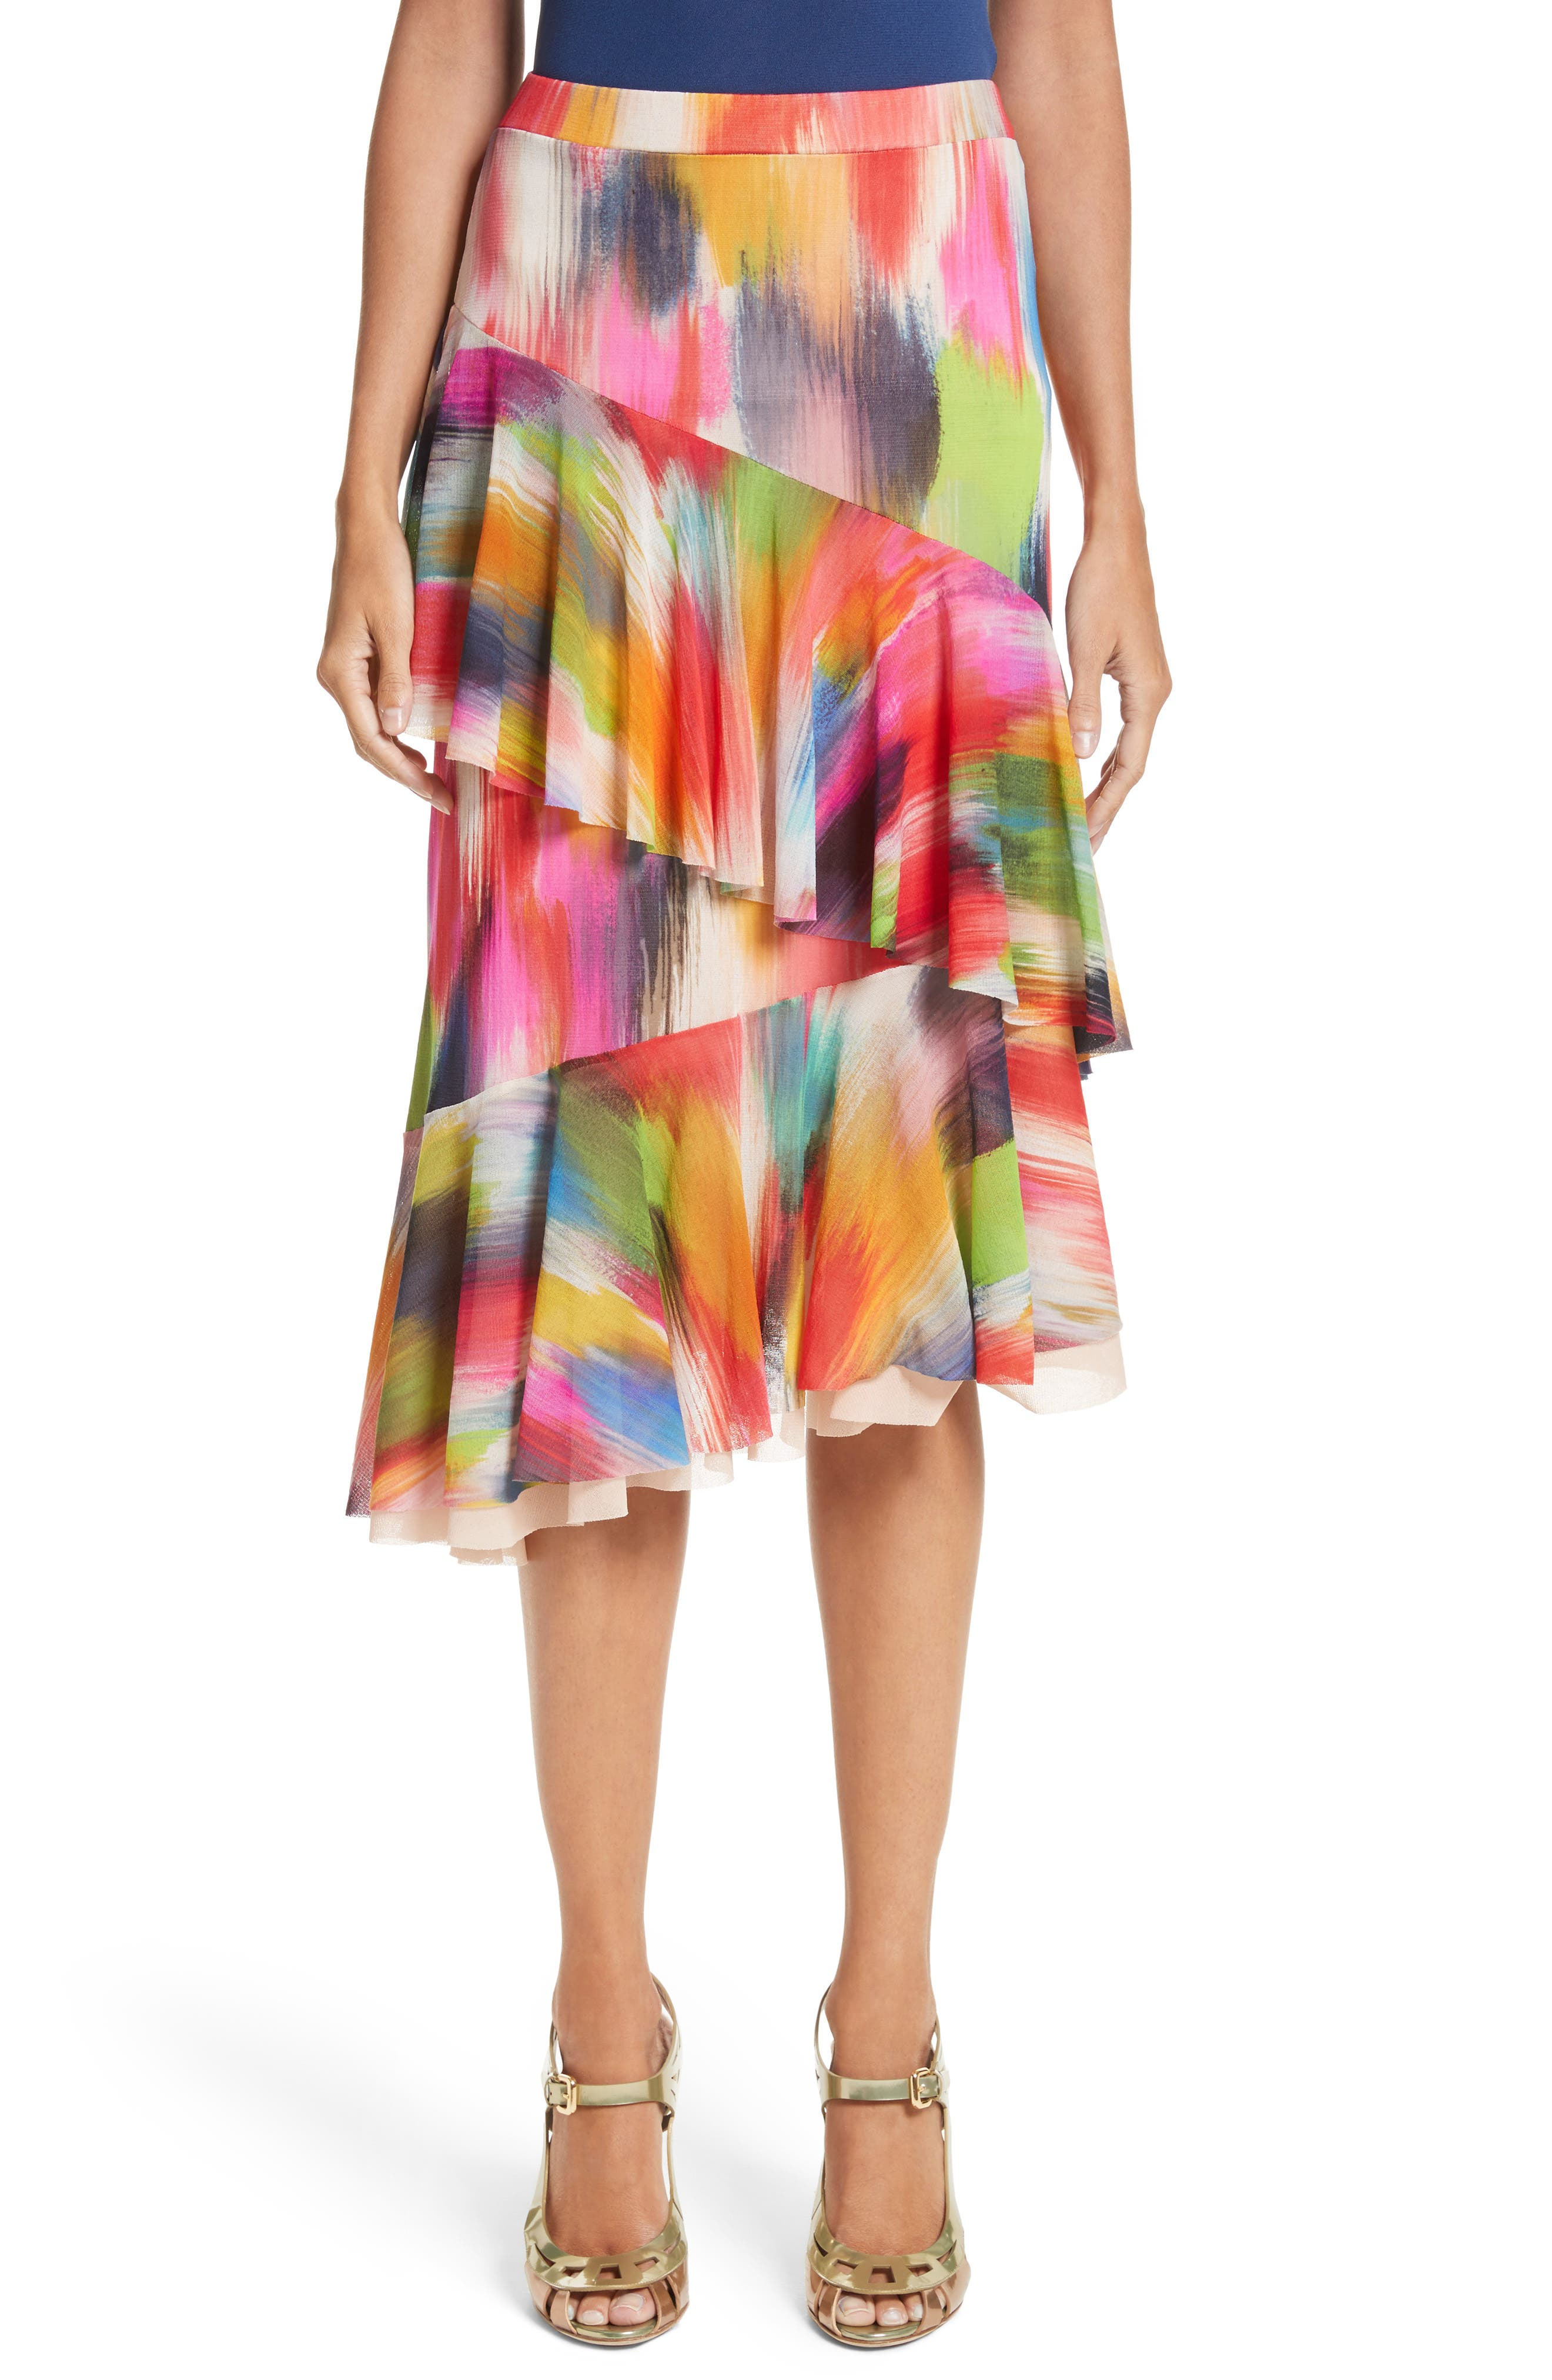 Alternate Image 1 Selected - Fuzzi Ruffle Print Tulle Midi Skirt